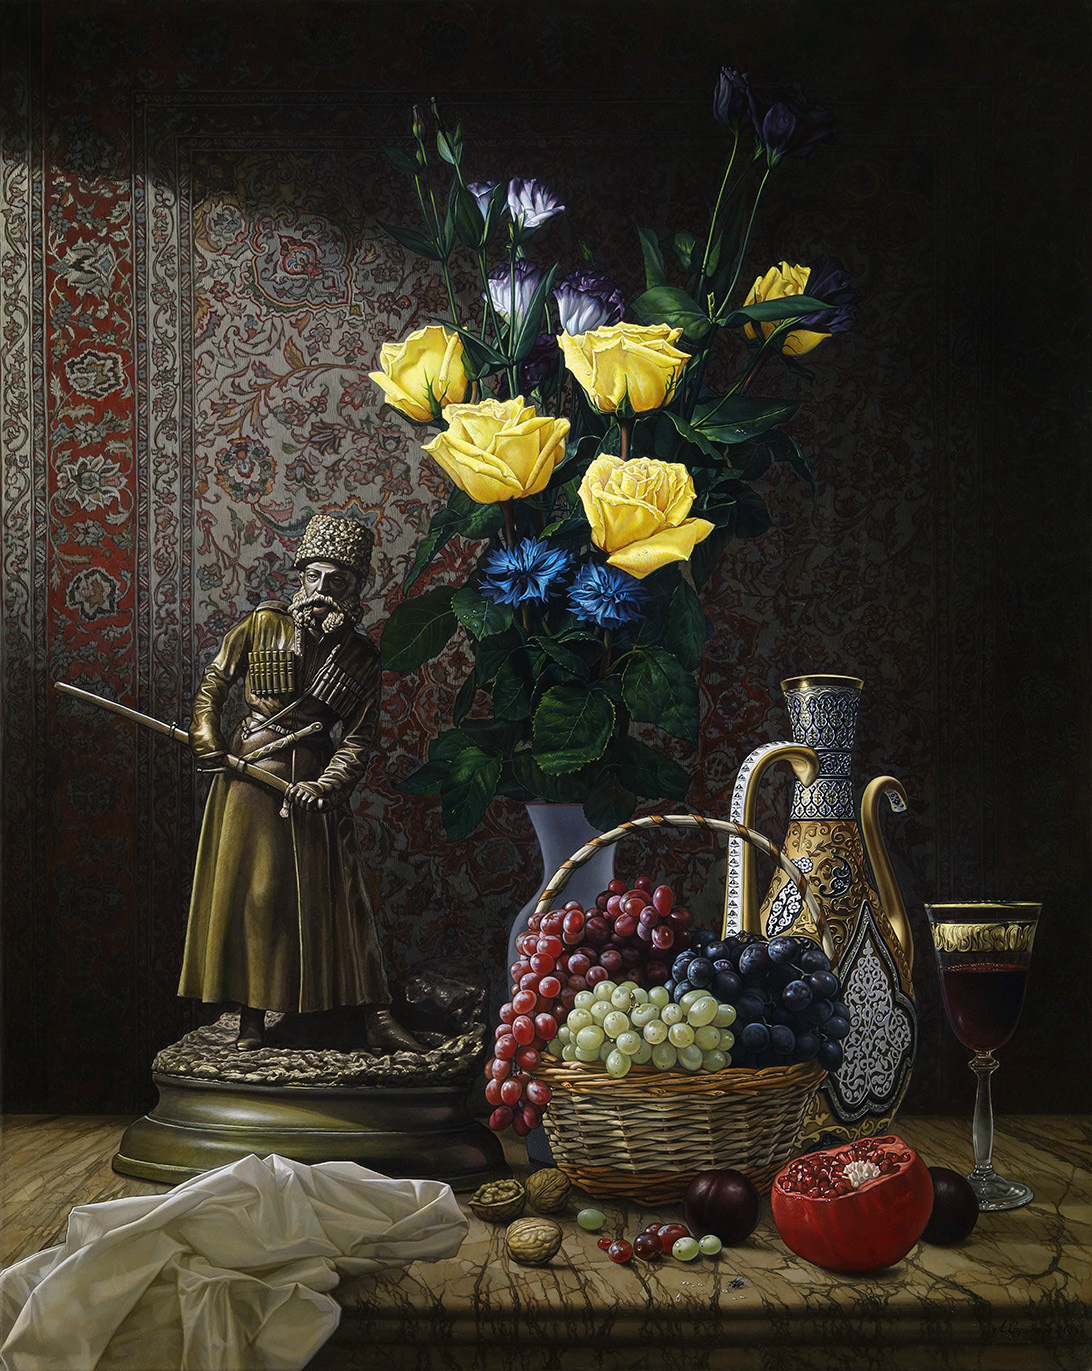 Alexander Mikhailovich Sushenok. Gifts of the Caucasus. 2018-19.